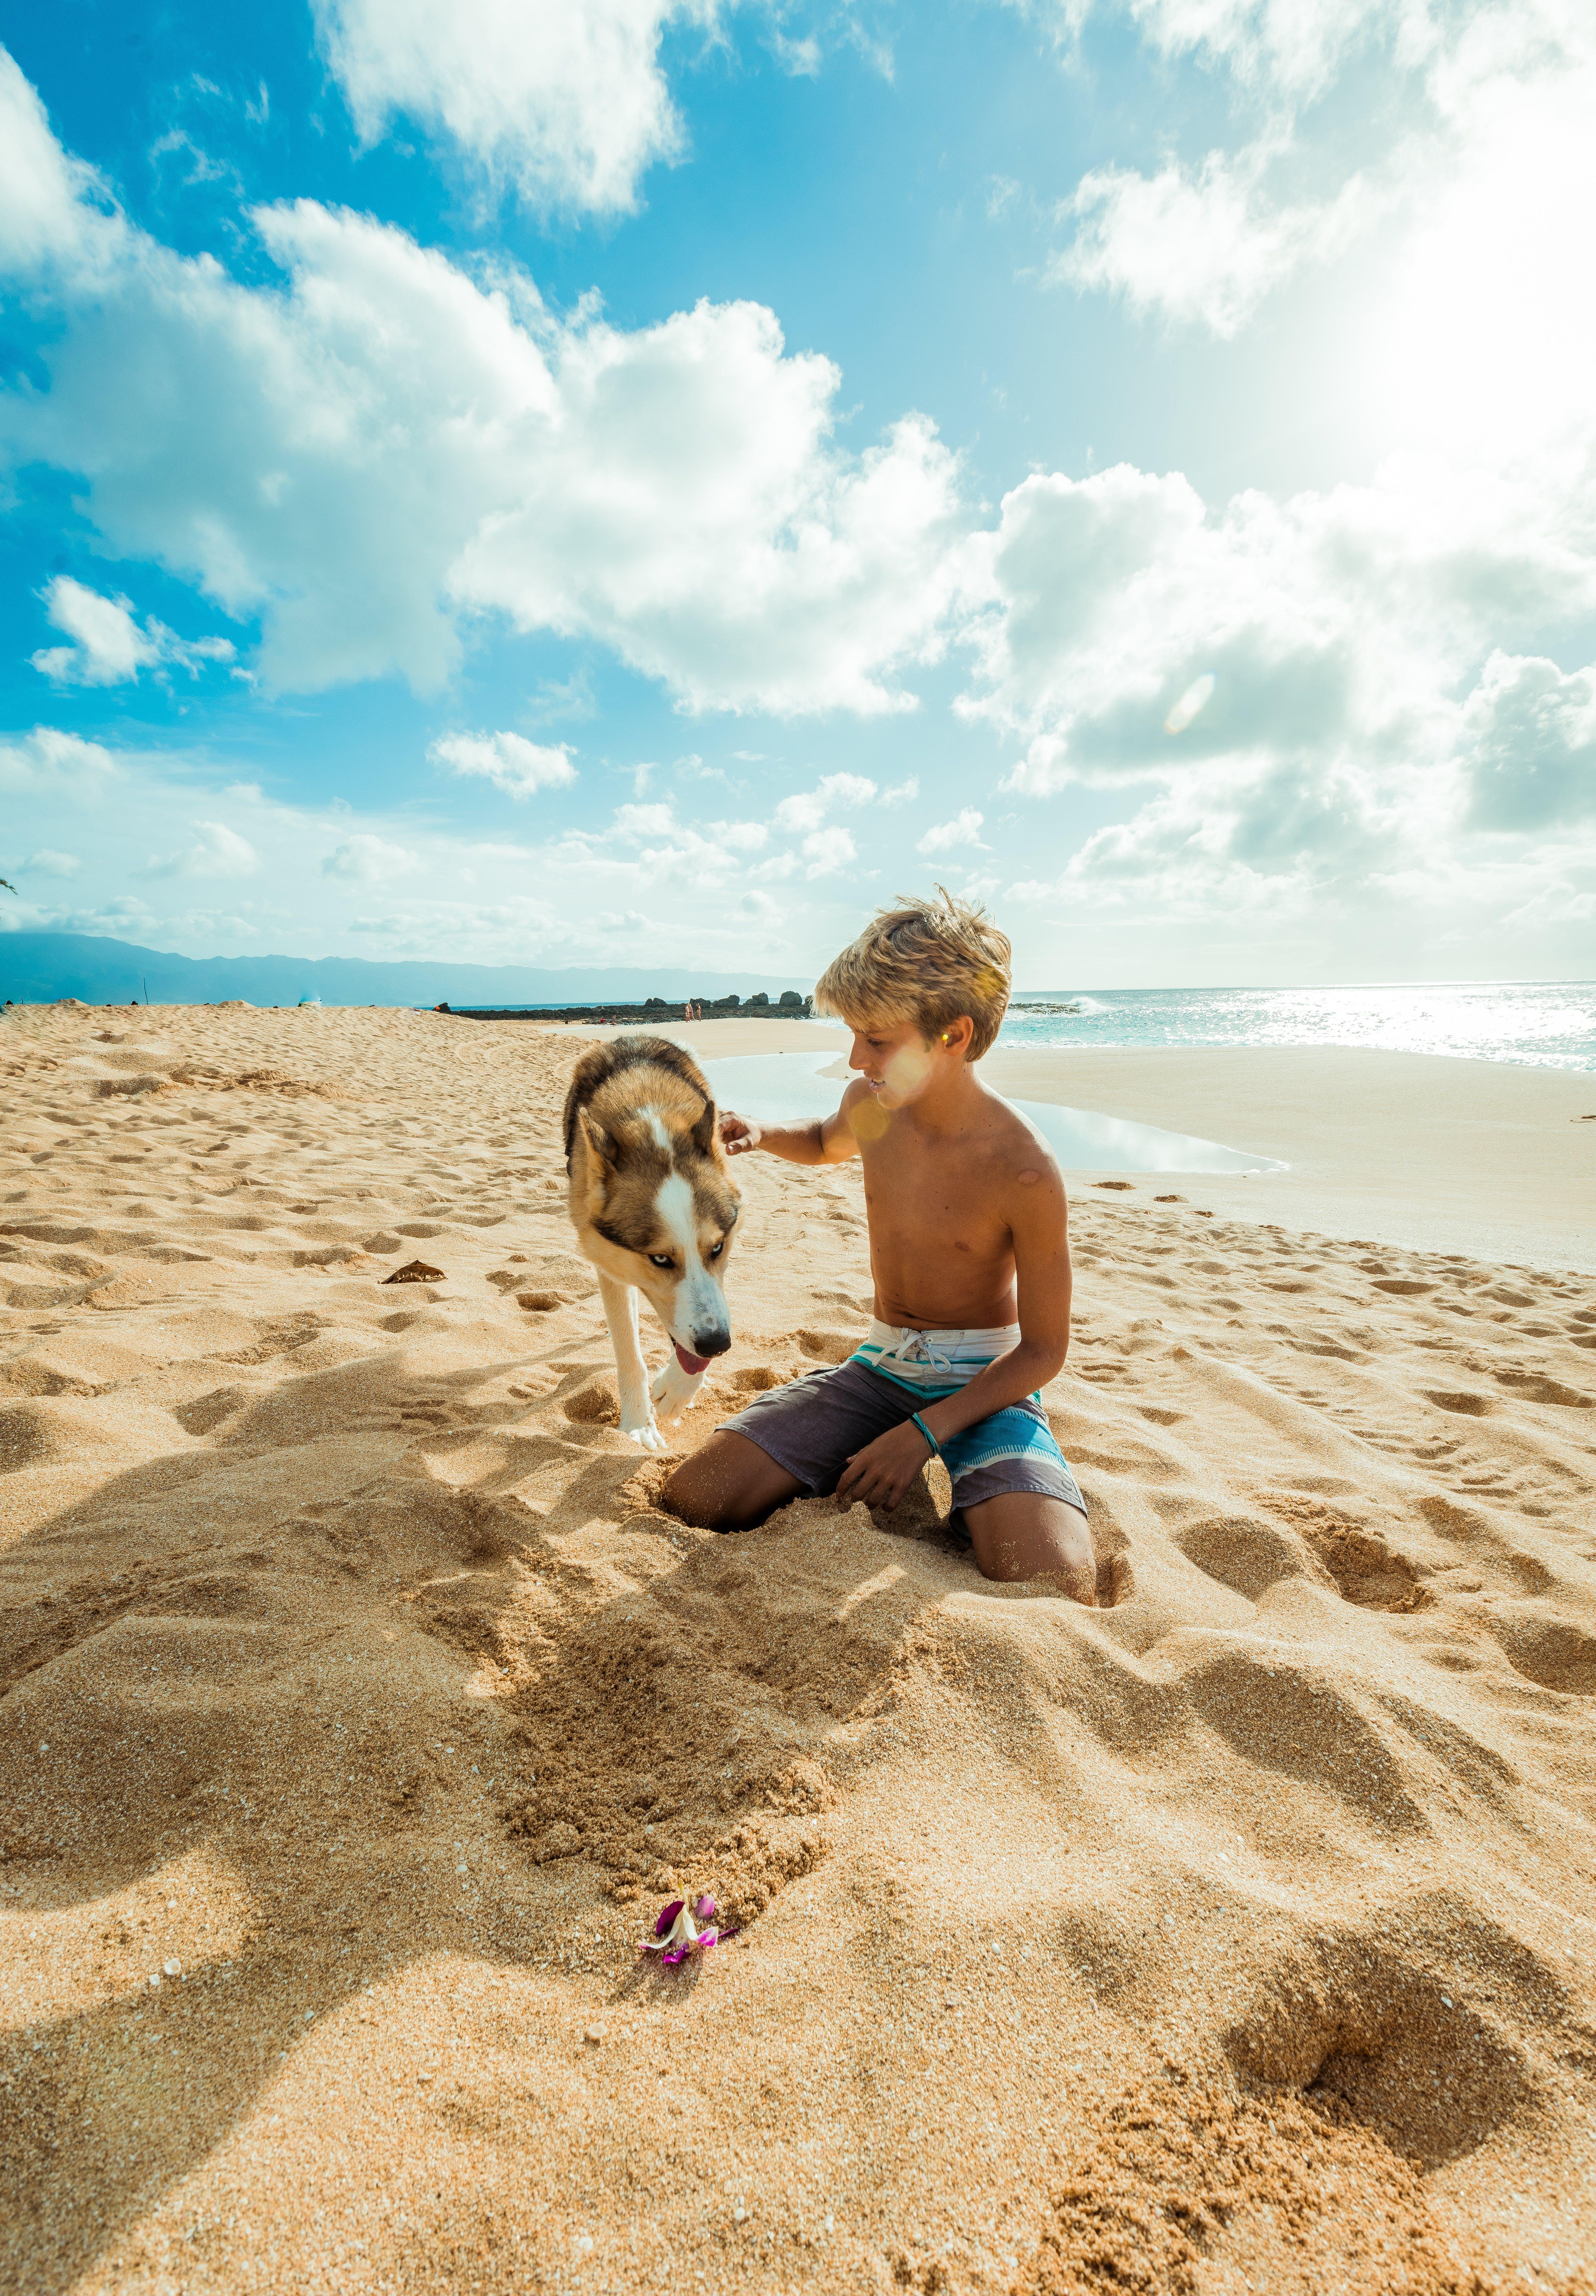 Boy Seating on Brown Sand